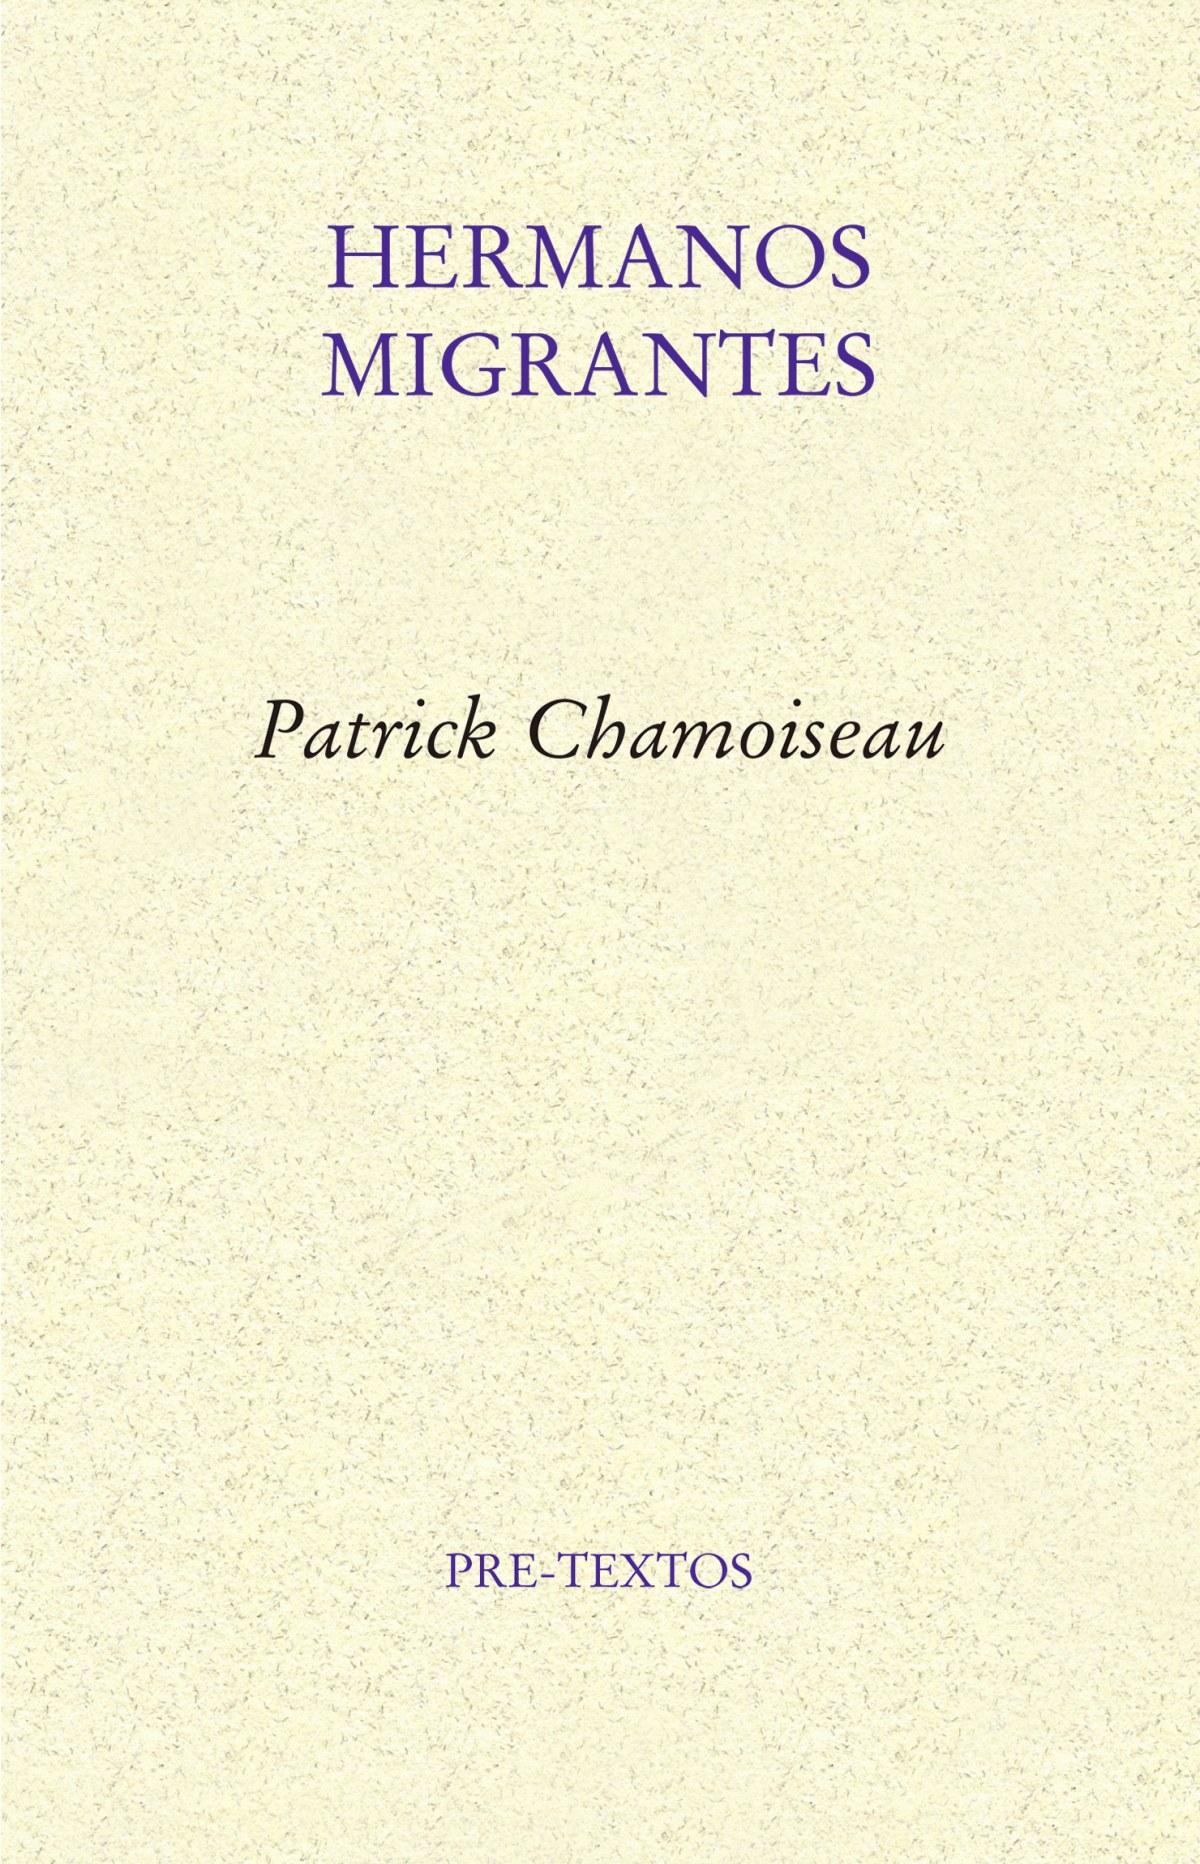 Hermanos migrantes